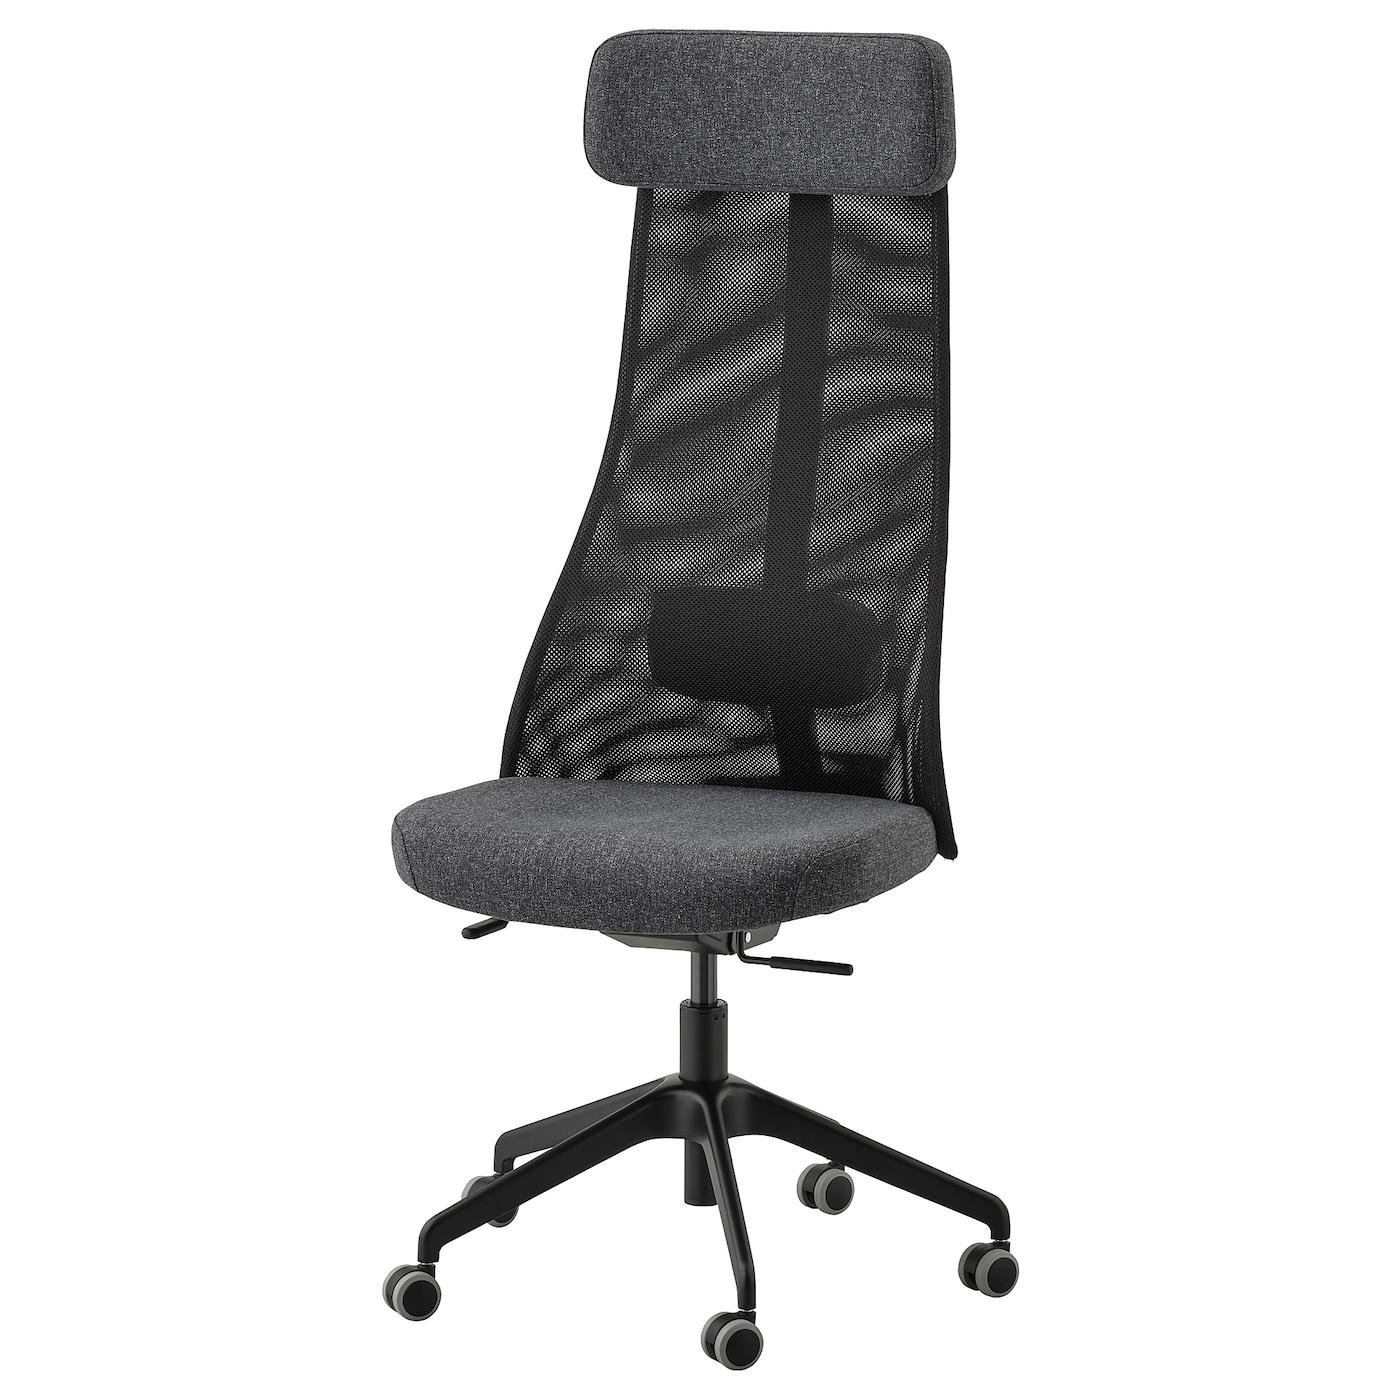 Ikea JARVFJALLET Office chair, Gunnared dark gray